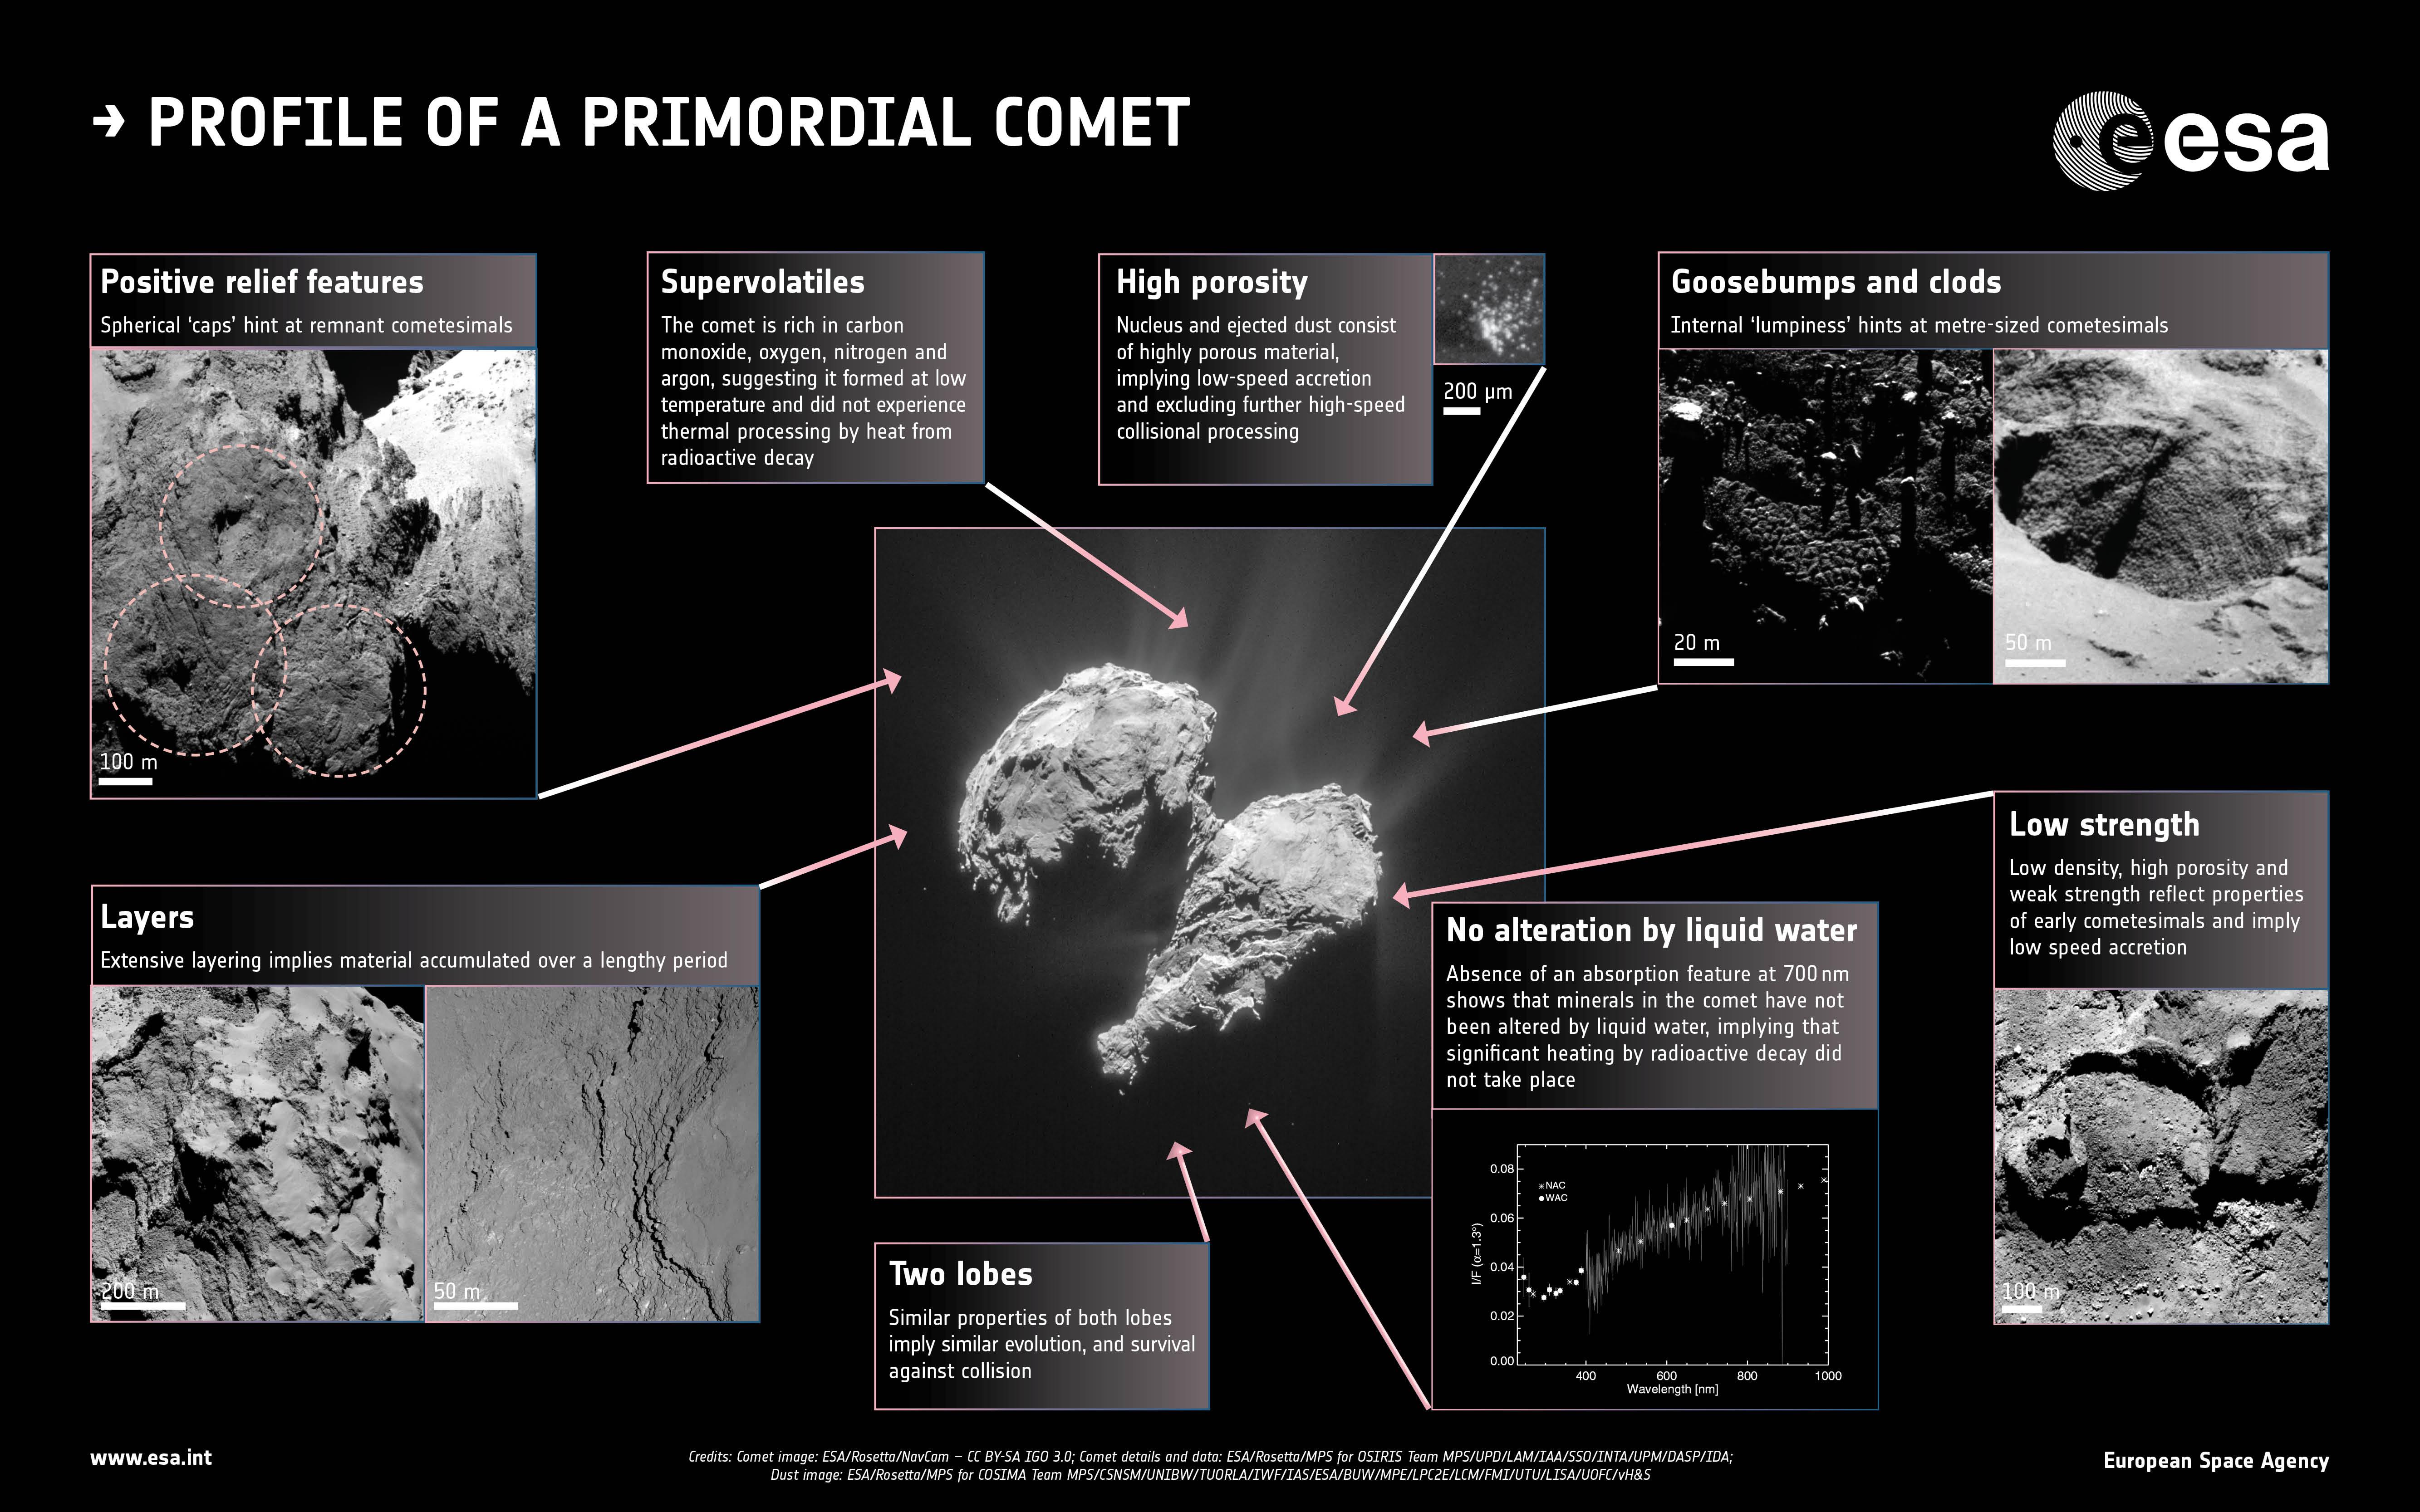 La cometa 67P. Crediti: Centre: ESA/Rosetta/NavCam – CC BY-SA IGO 3.0; Insets: ESA/Rosetta/MPS for OSIRIS Team MPS/UPD/LAM/IAA/SSO/INTA/UPM/DASP/IDA; Fornasier et al. (2015); ESA/Rosetta/MPS for COSIMA Team MPS/CSNSM/UNIBW/TUORLA/IWF/IAS/ESA/BUW/MPE/LPC2E/LCM/FMI/UTU/LISA/UOFC/vH&S; Langevin et al. (2016)